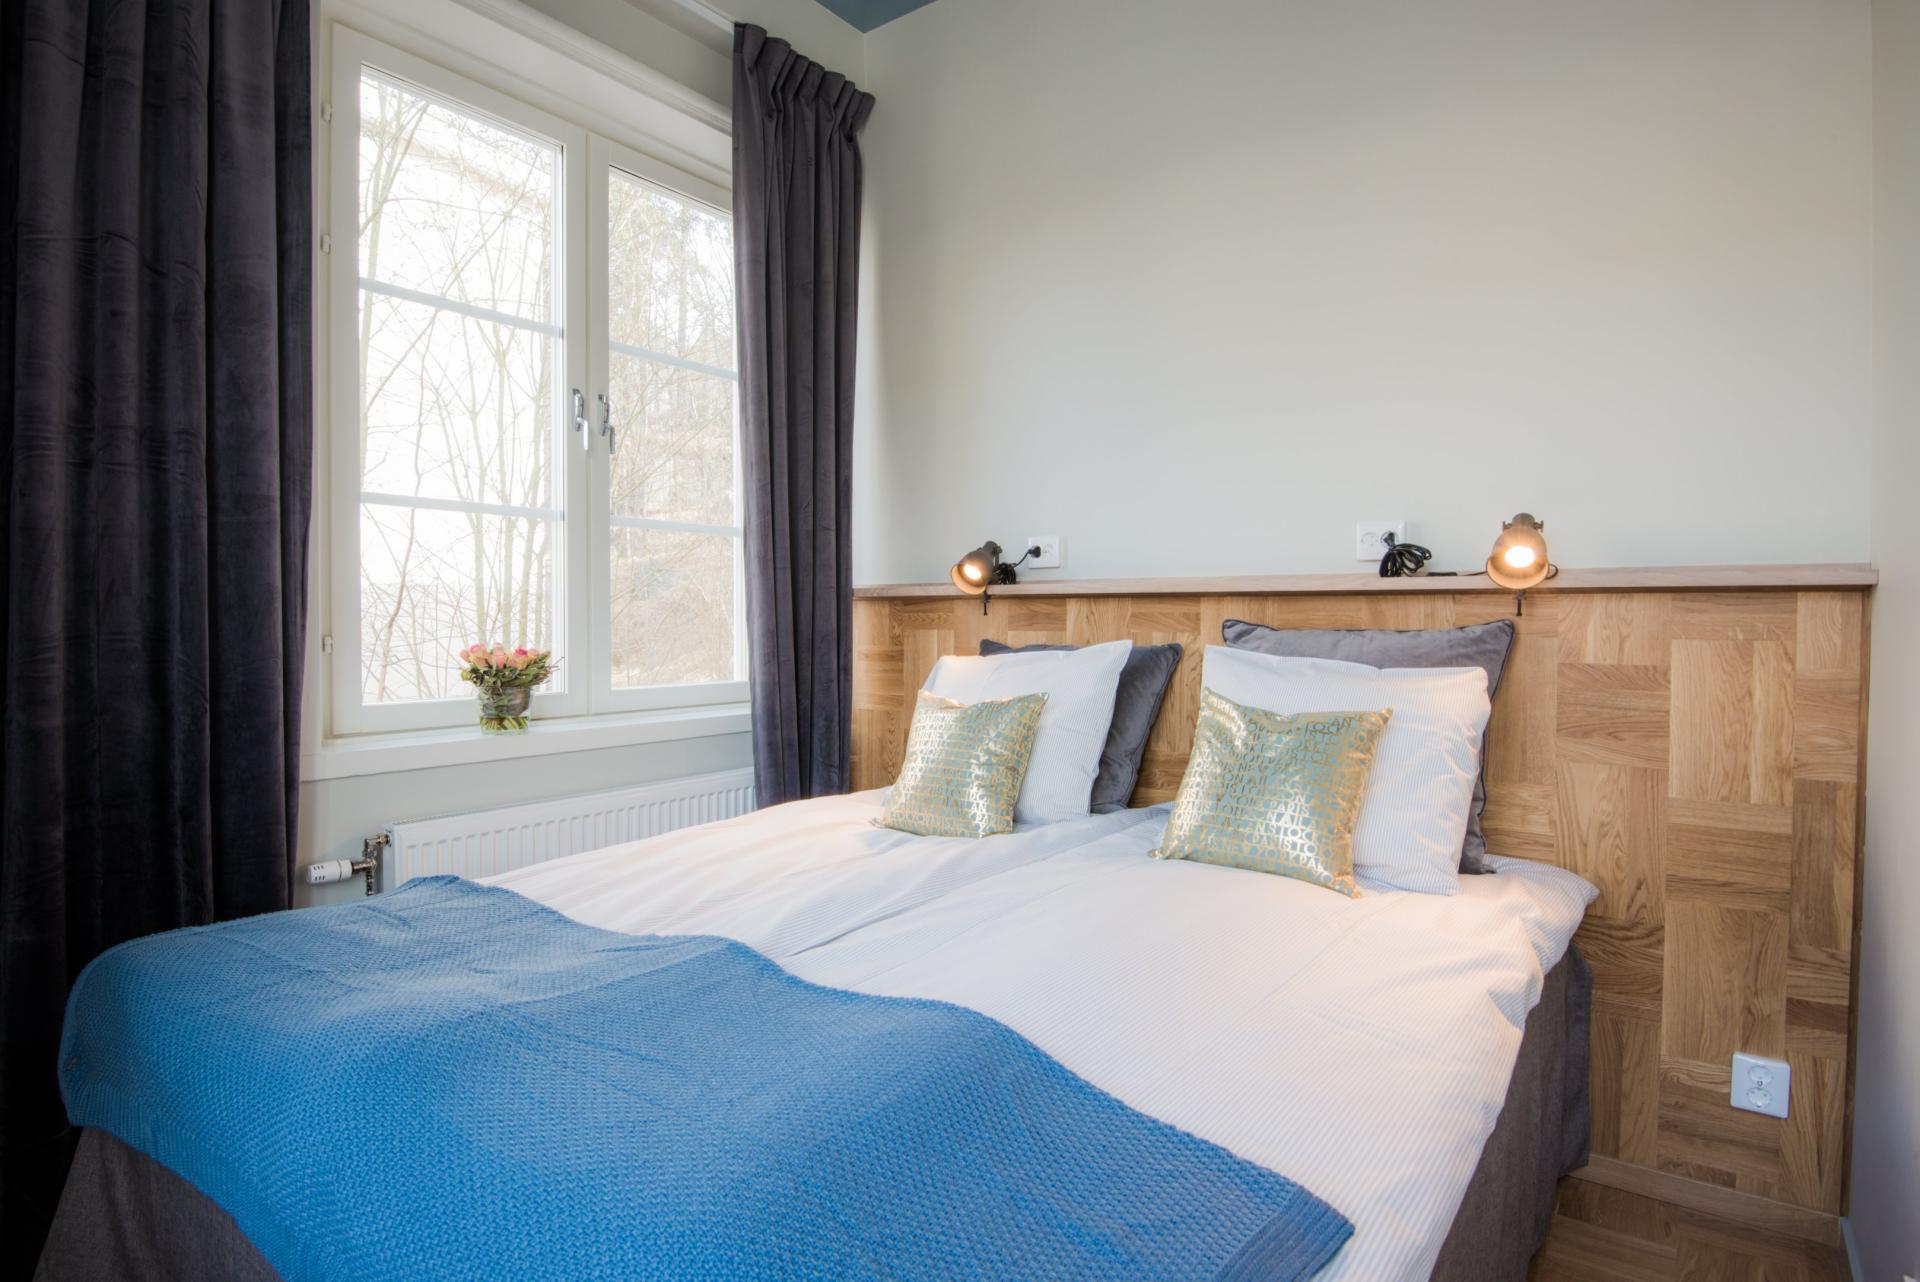 Bedroom at Voltavagen Apartment - Citybase Apartments